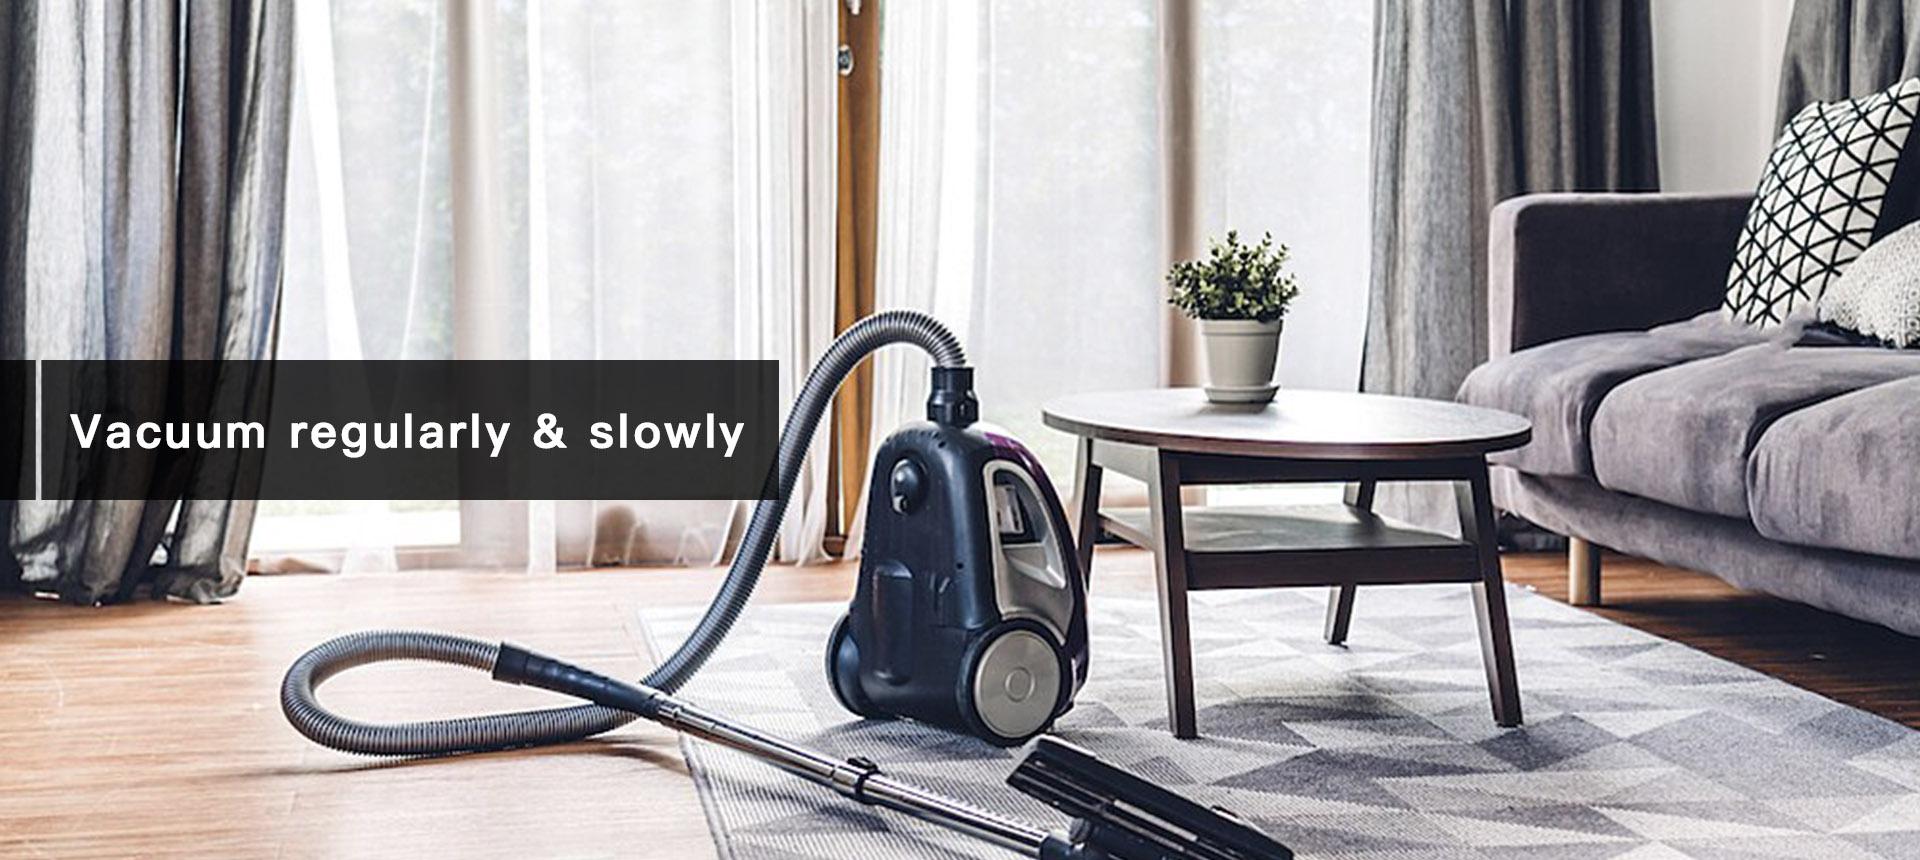 Use Vacuum properly